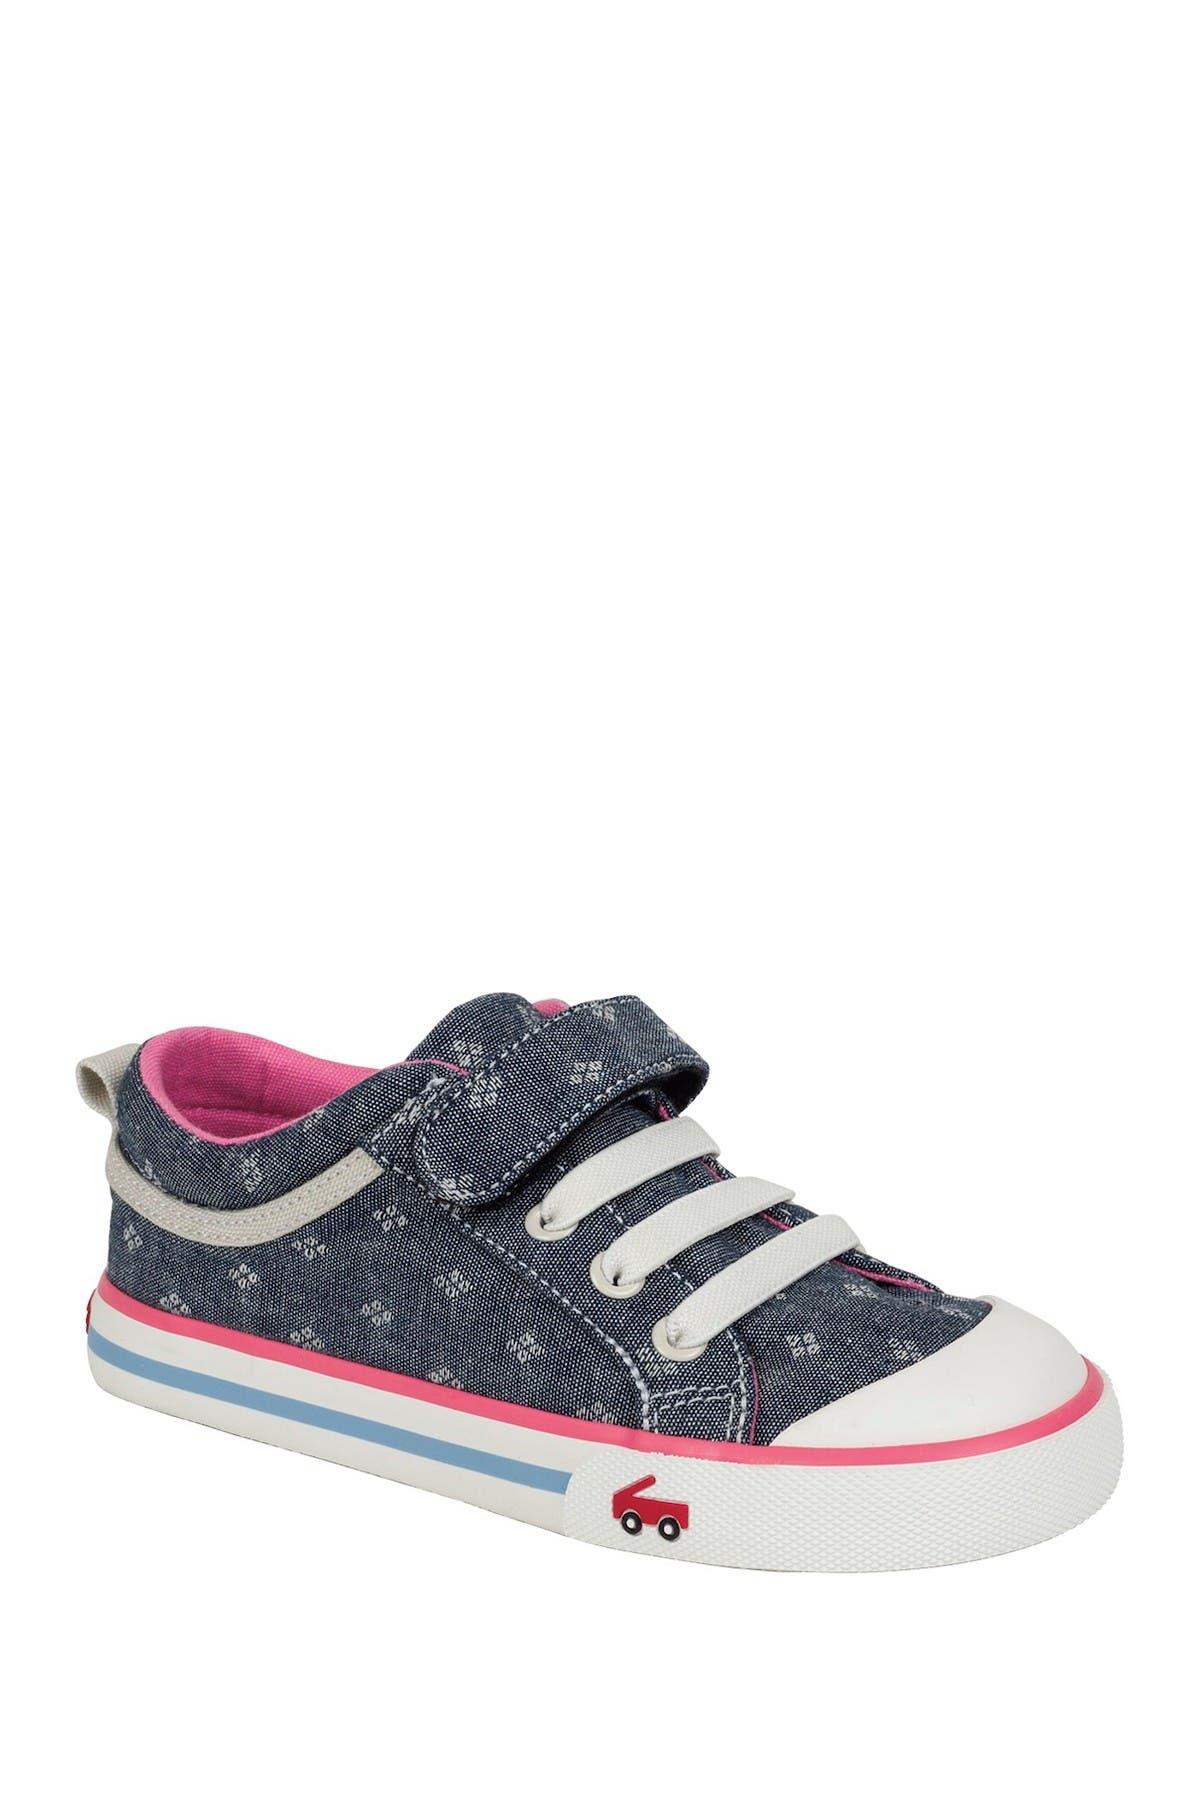 Image of See Kai Run Kristin Denim Sneaker